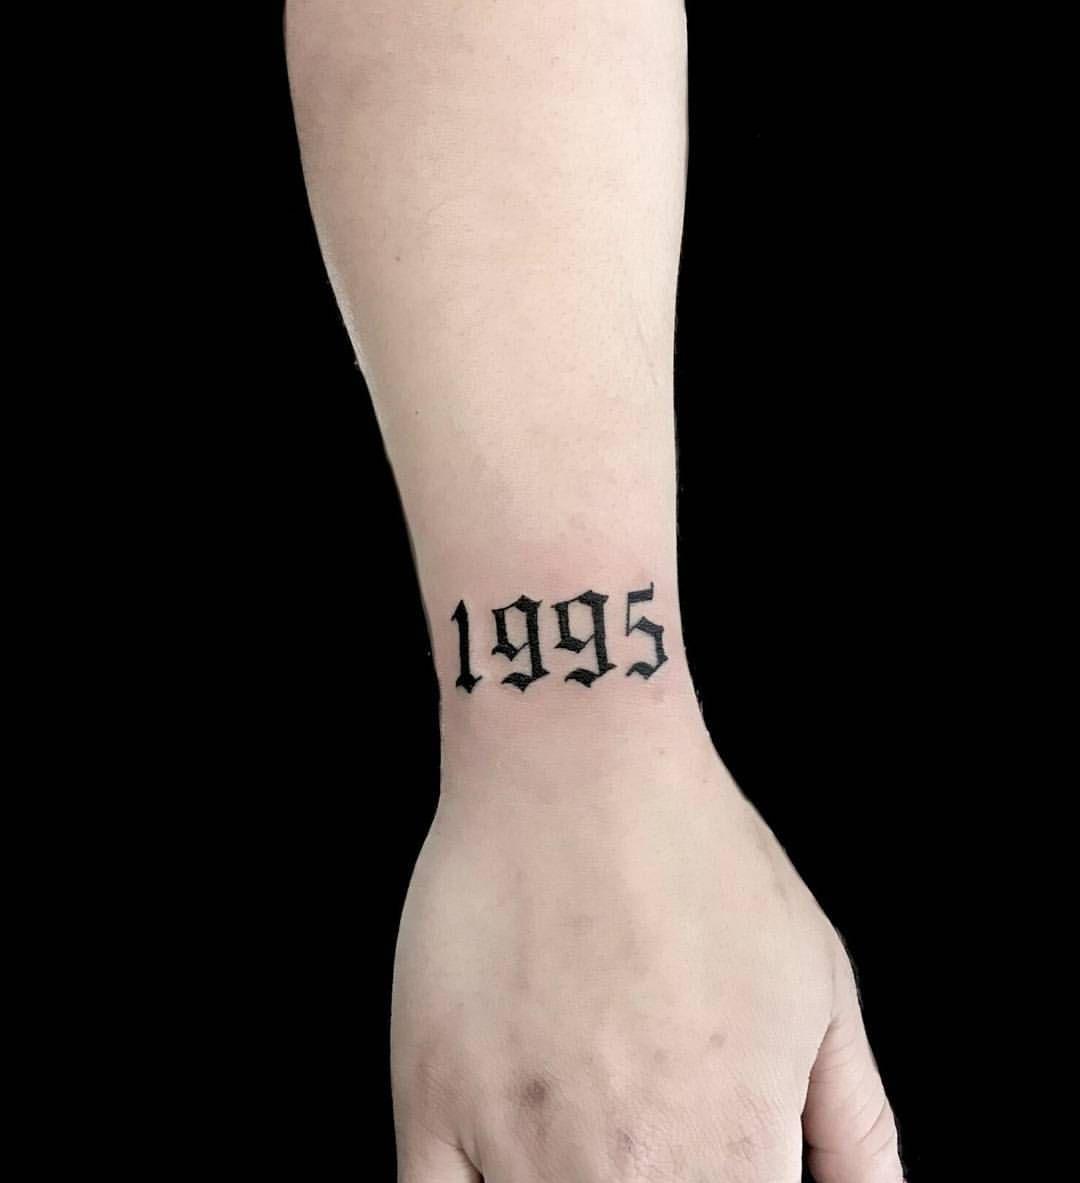 1995 Tattoo Design: #scripttattoos #oldenglish #1995 #blackwork #gangsterfonts